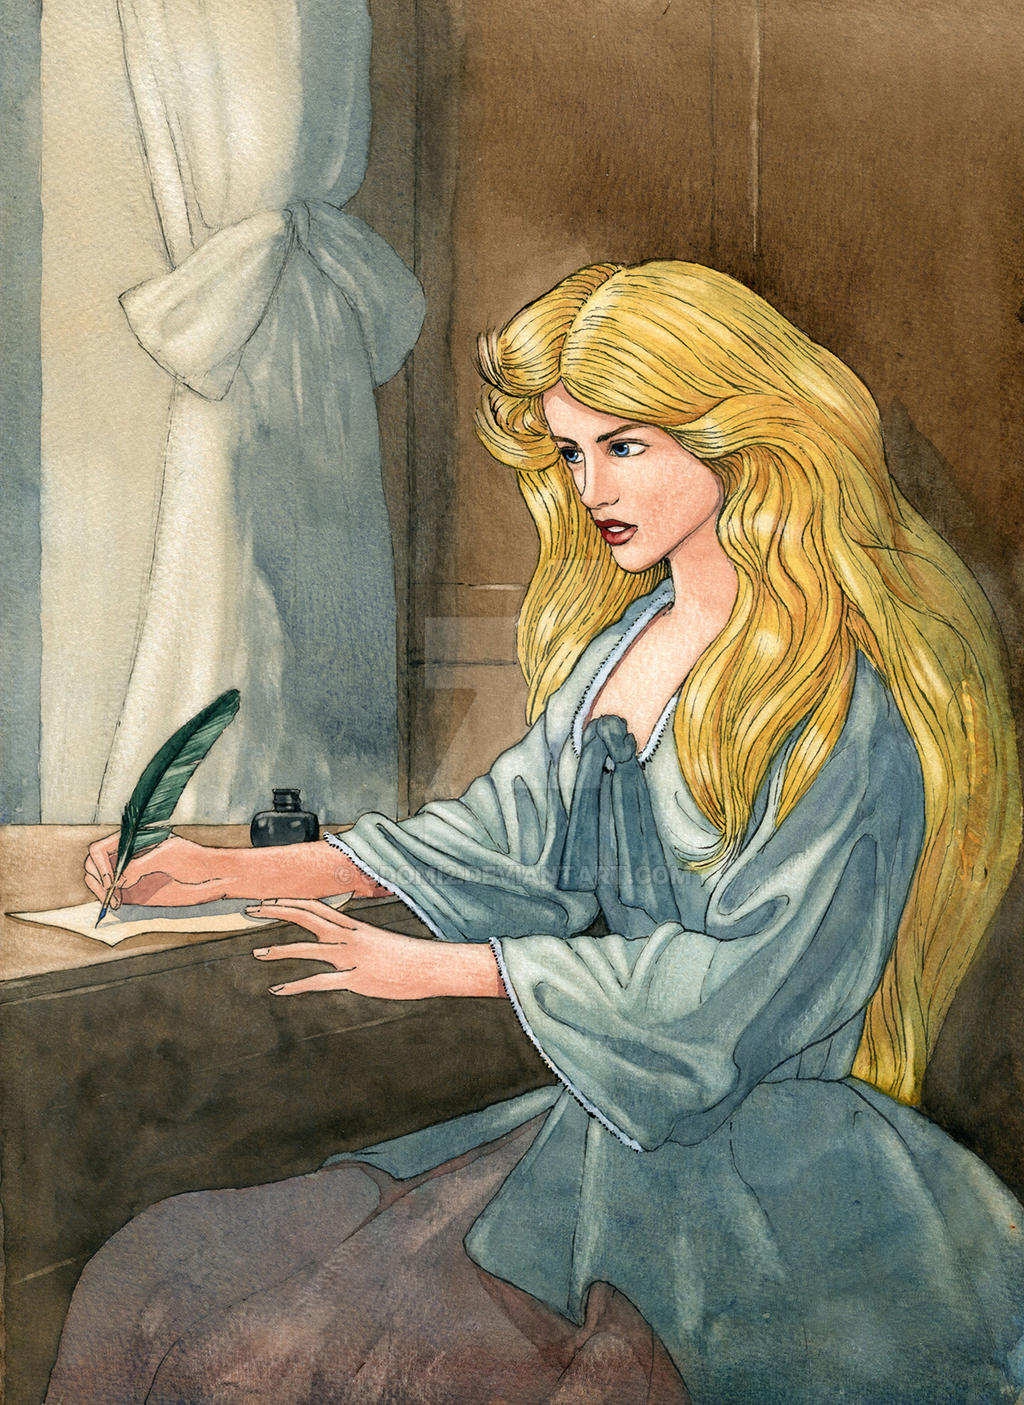 Elizabeth by Odomi2